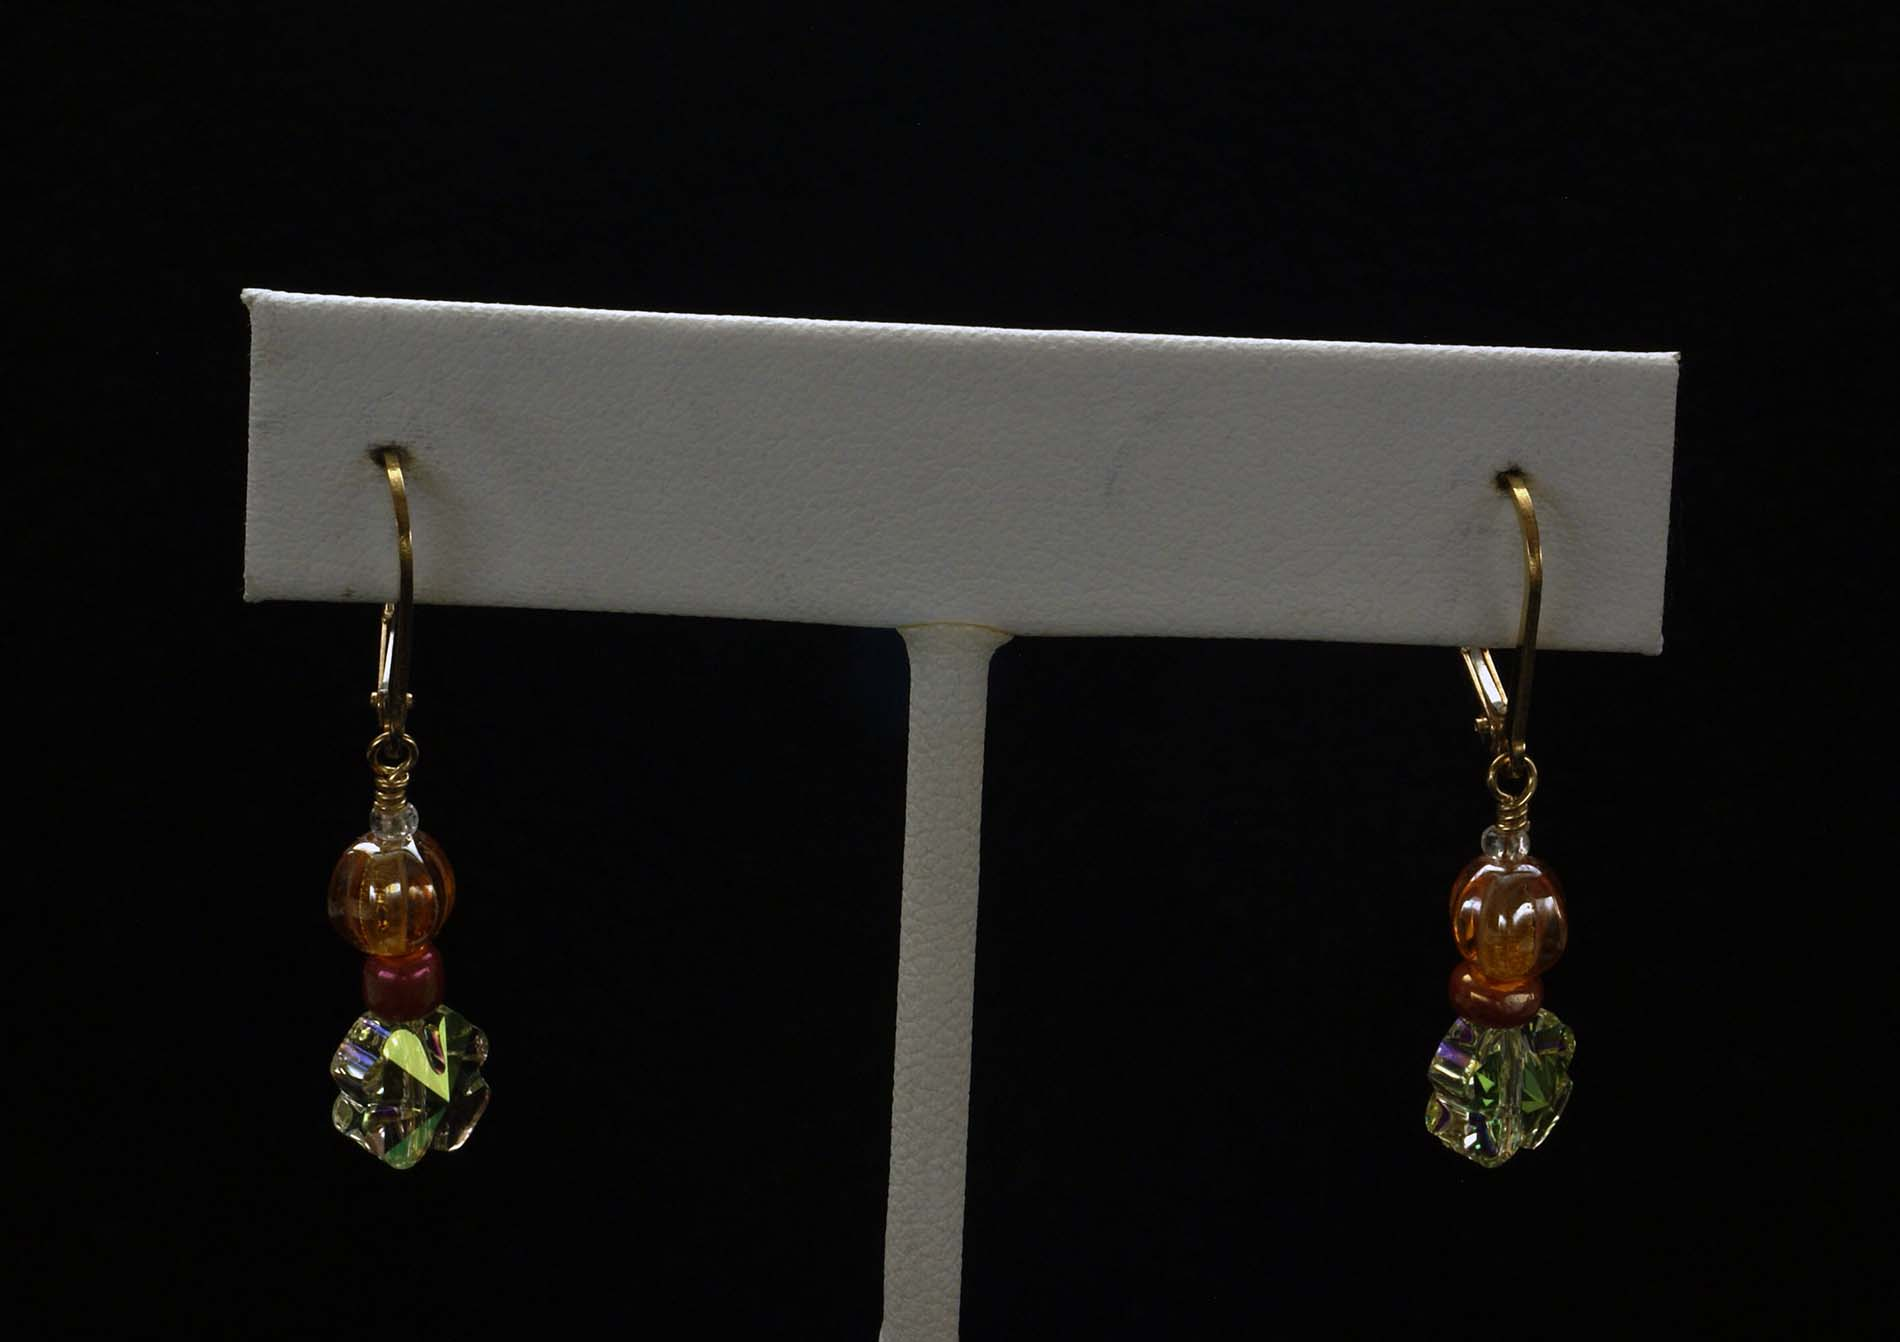 Small Bead Earrings